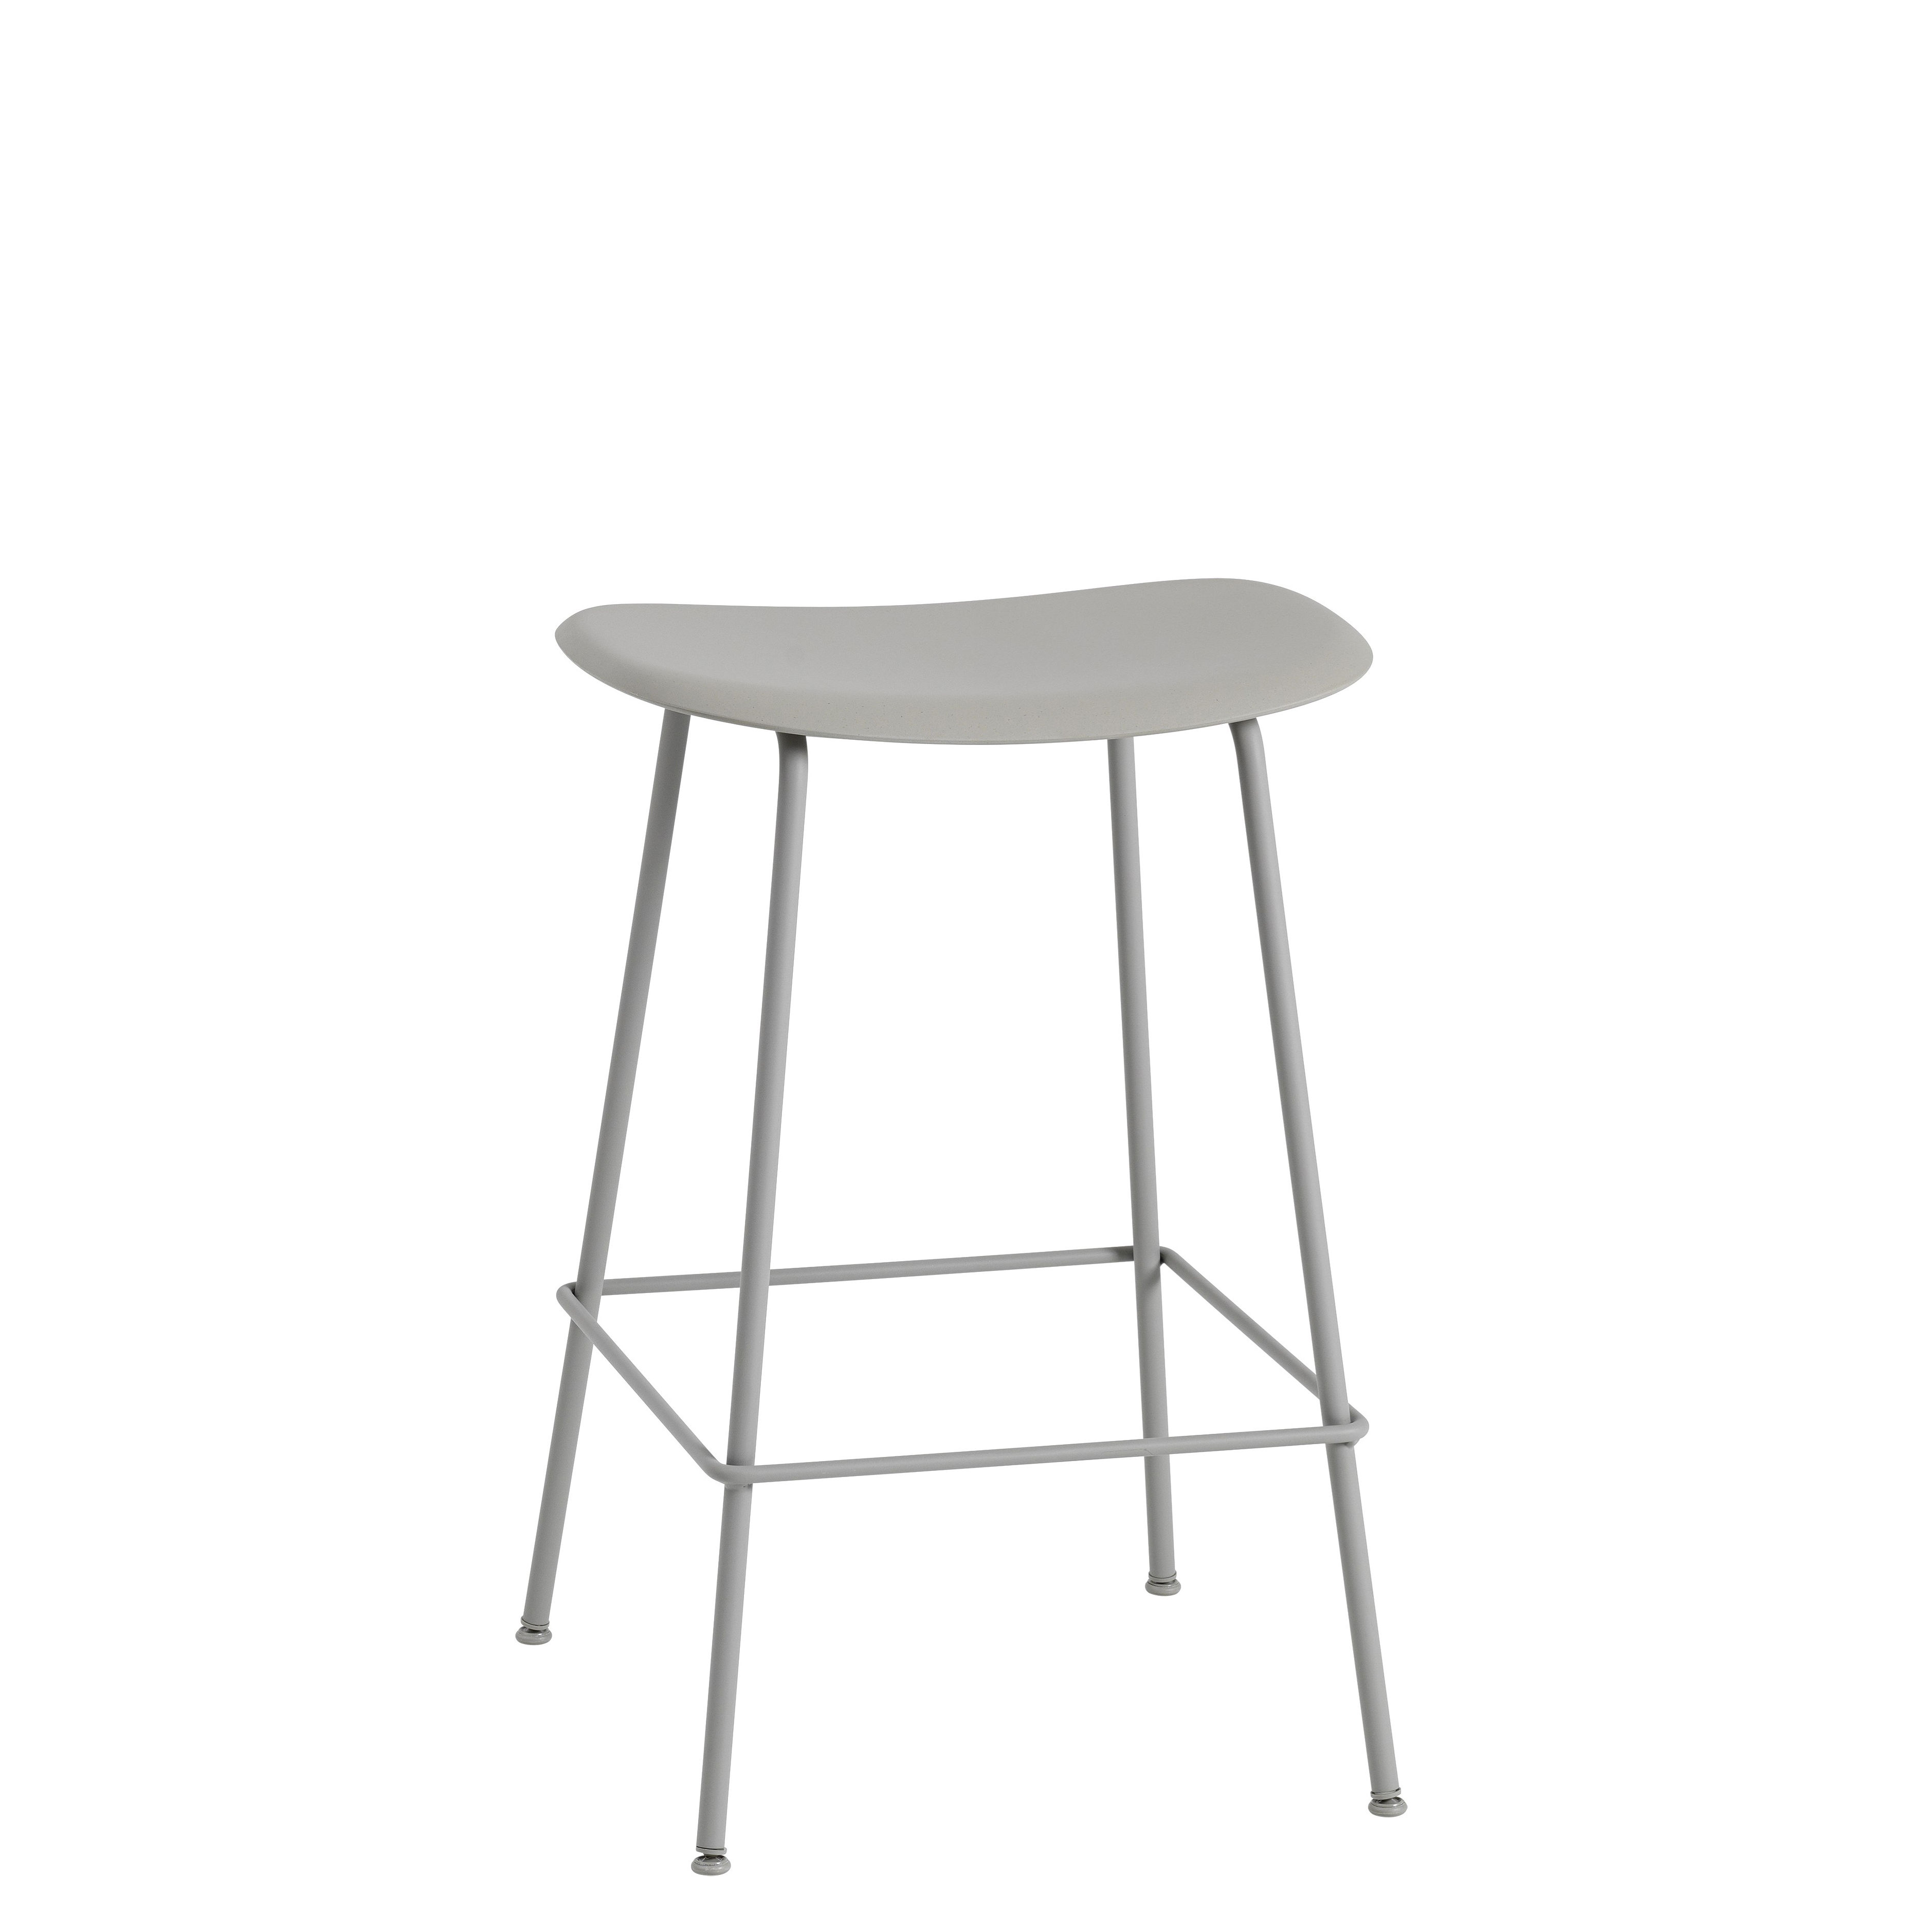 Möbel - Barhocker - Fiber Bar Barhocker / H 65 cm - Metallfüße - Muuto - Grau - bemalter Stahl, Recyceltes Verbundmaterial